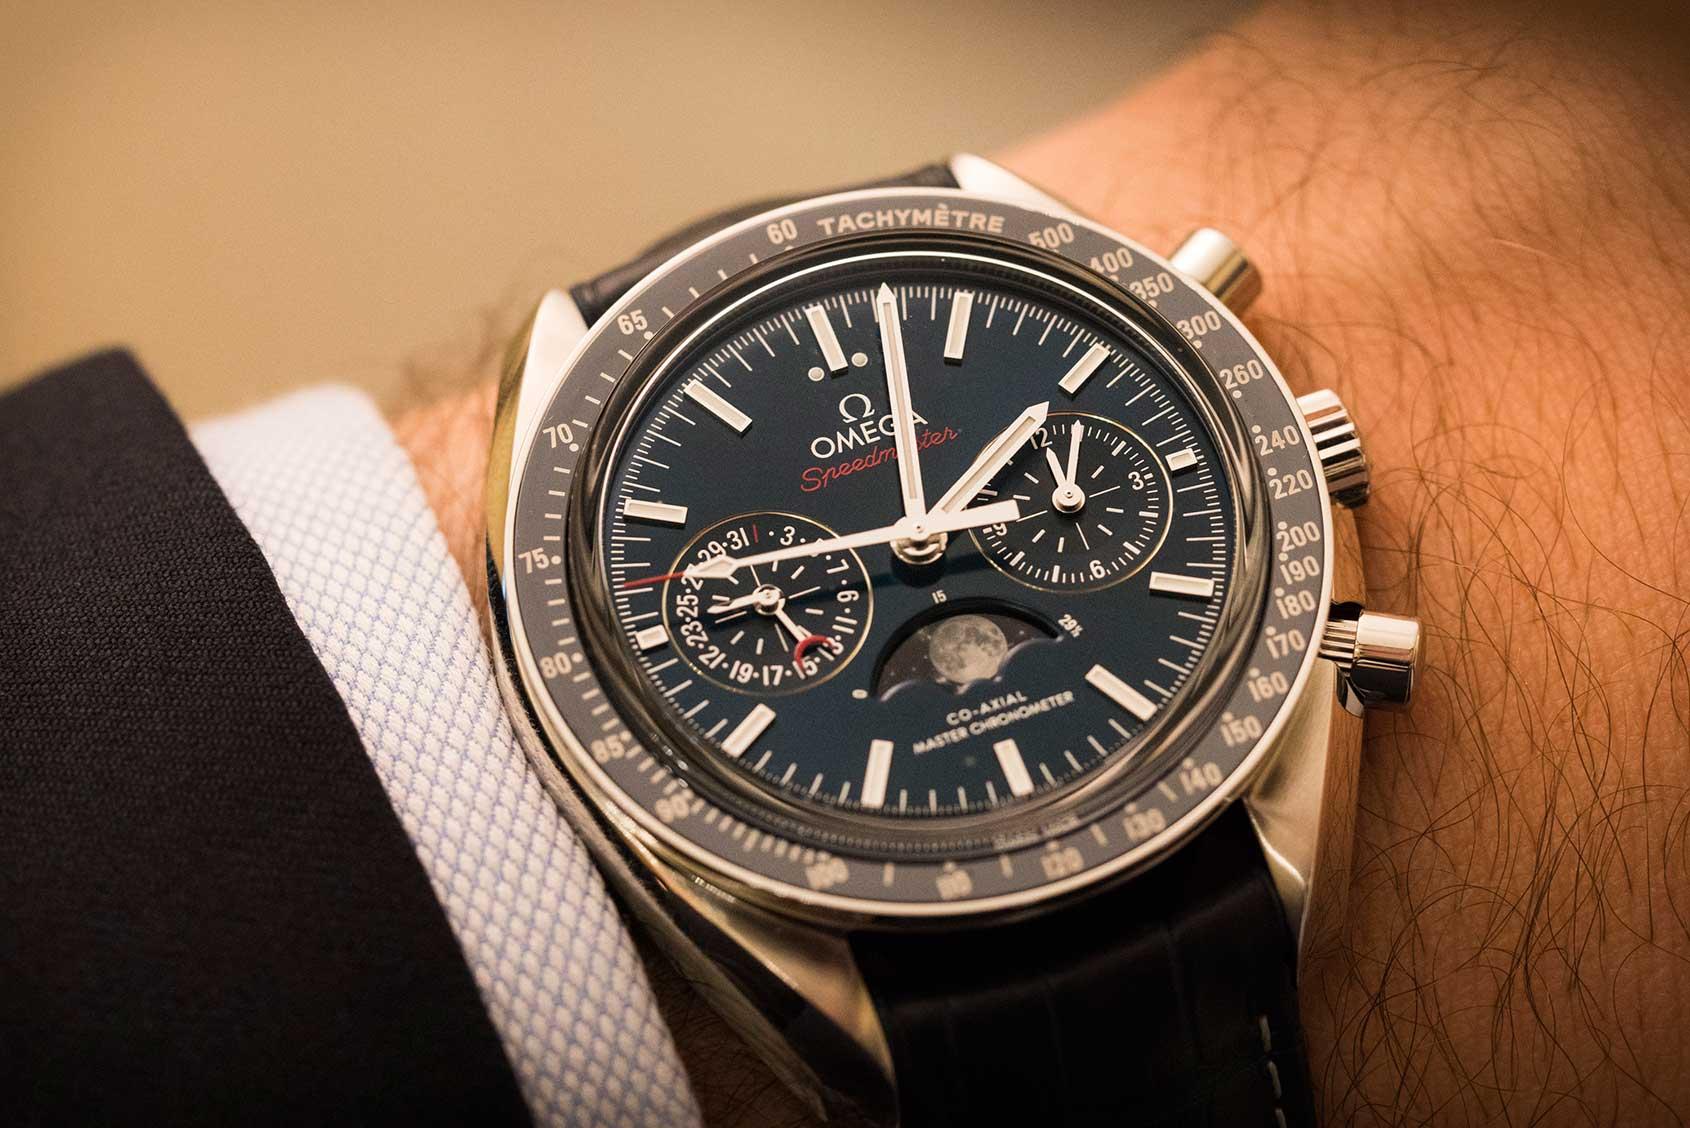 Omega-Speedmaster-Moonphase-Chronograph-Master-Chronometer-1